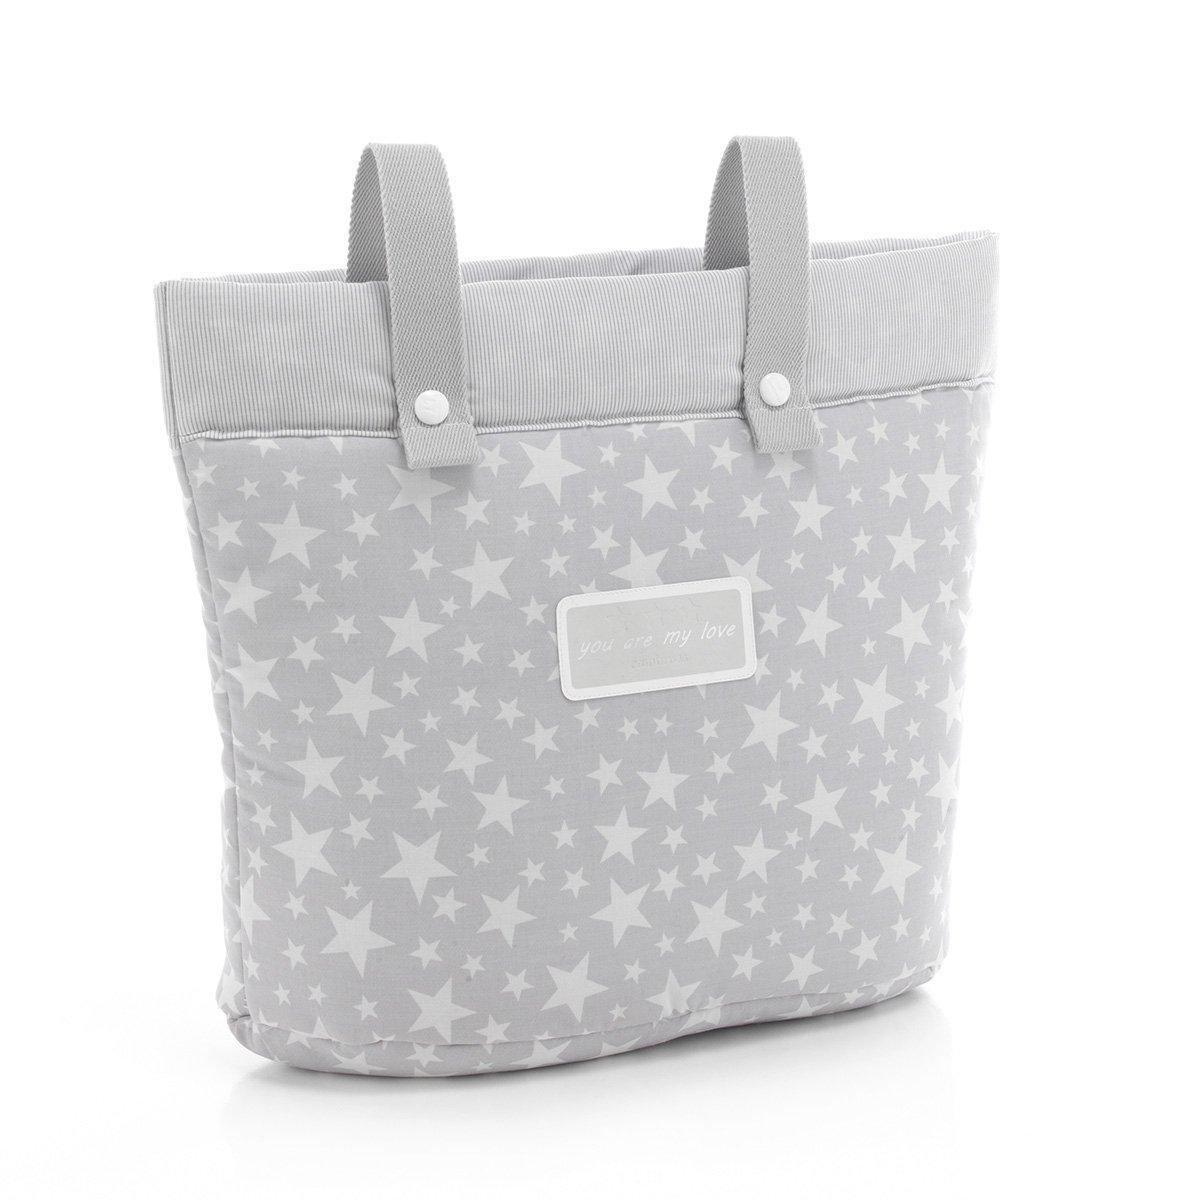 Amazon.com : Cambrass Star Stroller Diaper Bag, Blue : Baby